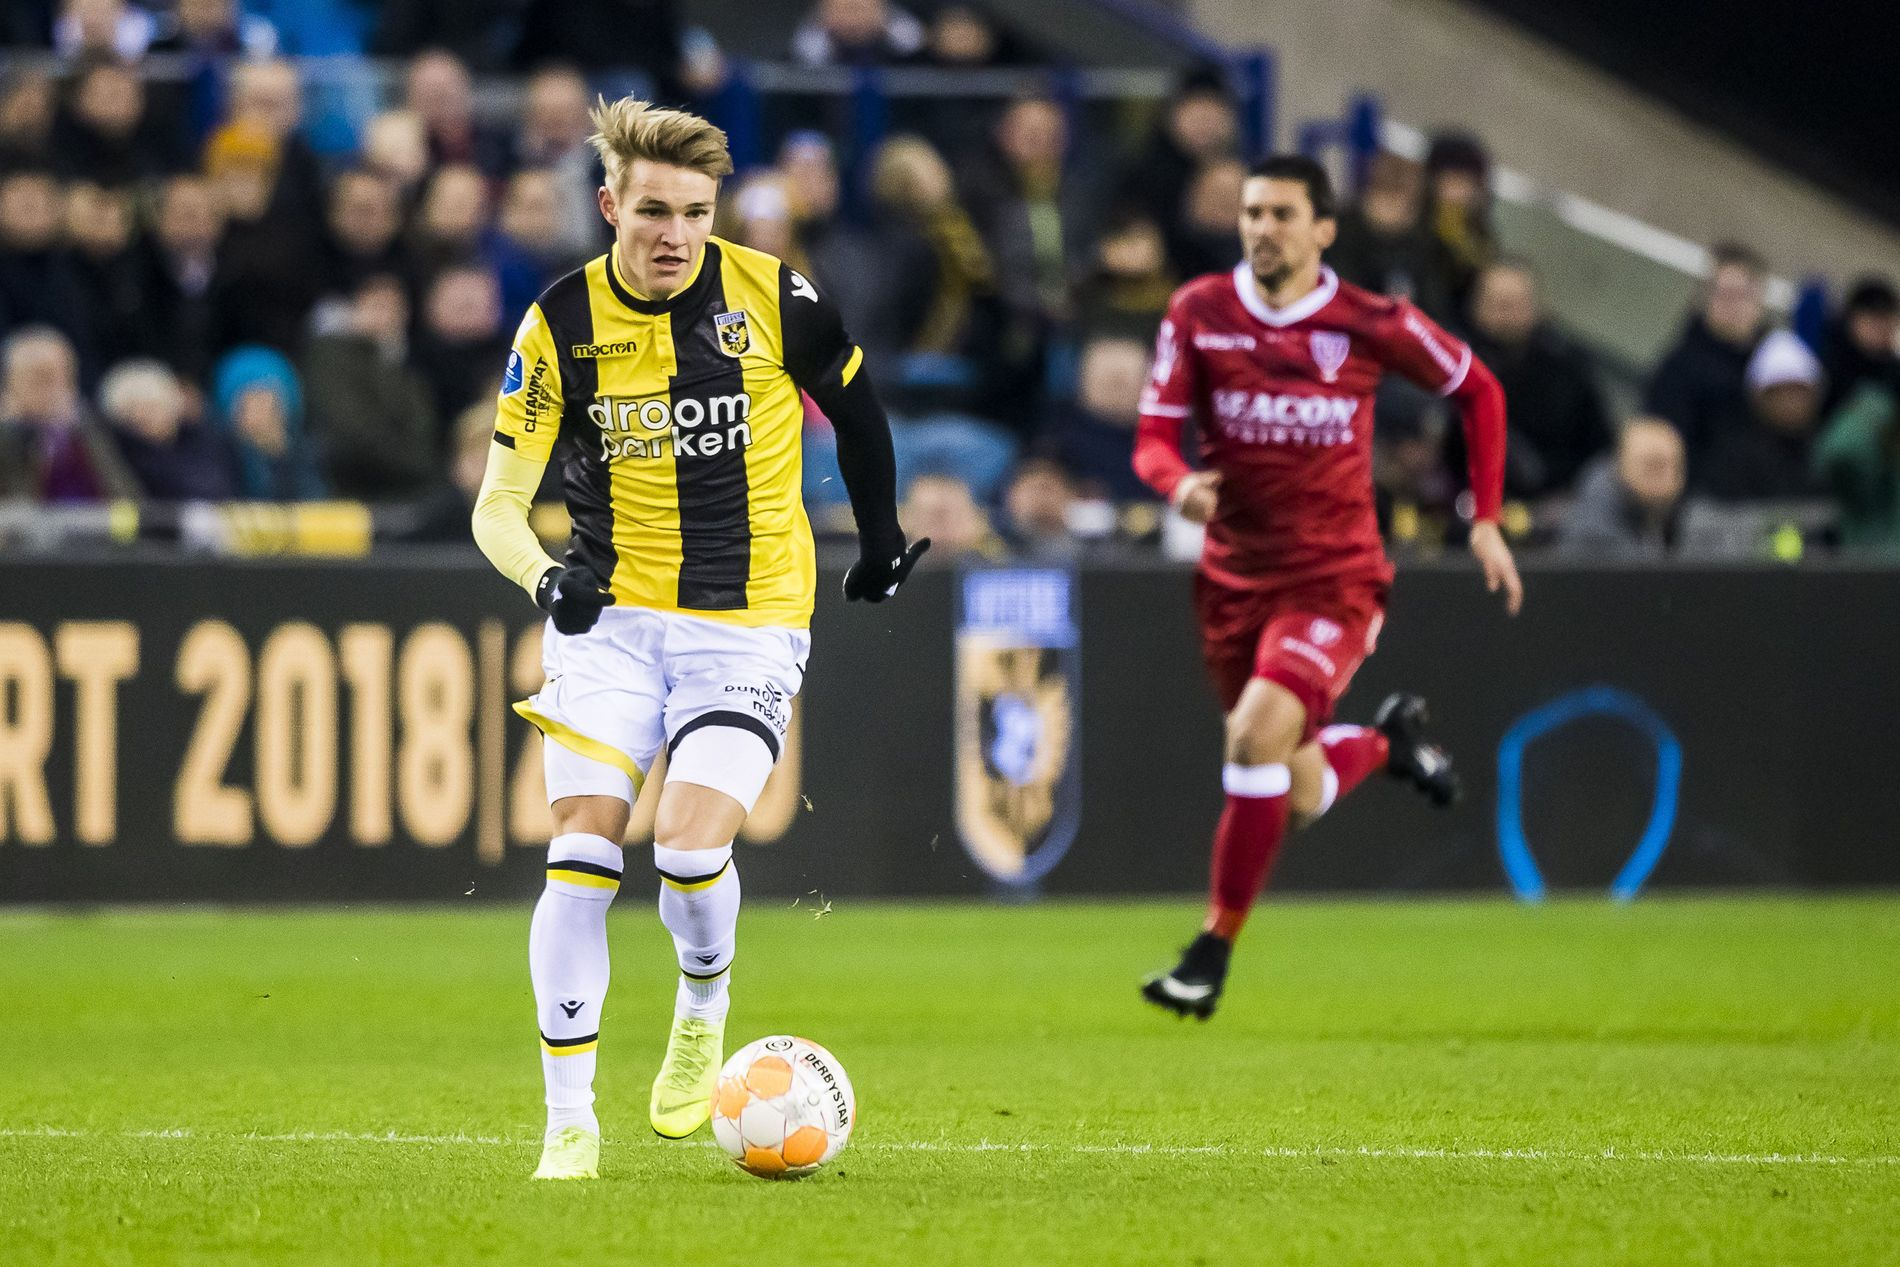 BRILJERTE: Martin Ødegaard med ballen i kampen mot  VVV-Venlo der nordmannen scoret kampens første mål.